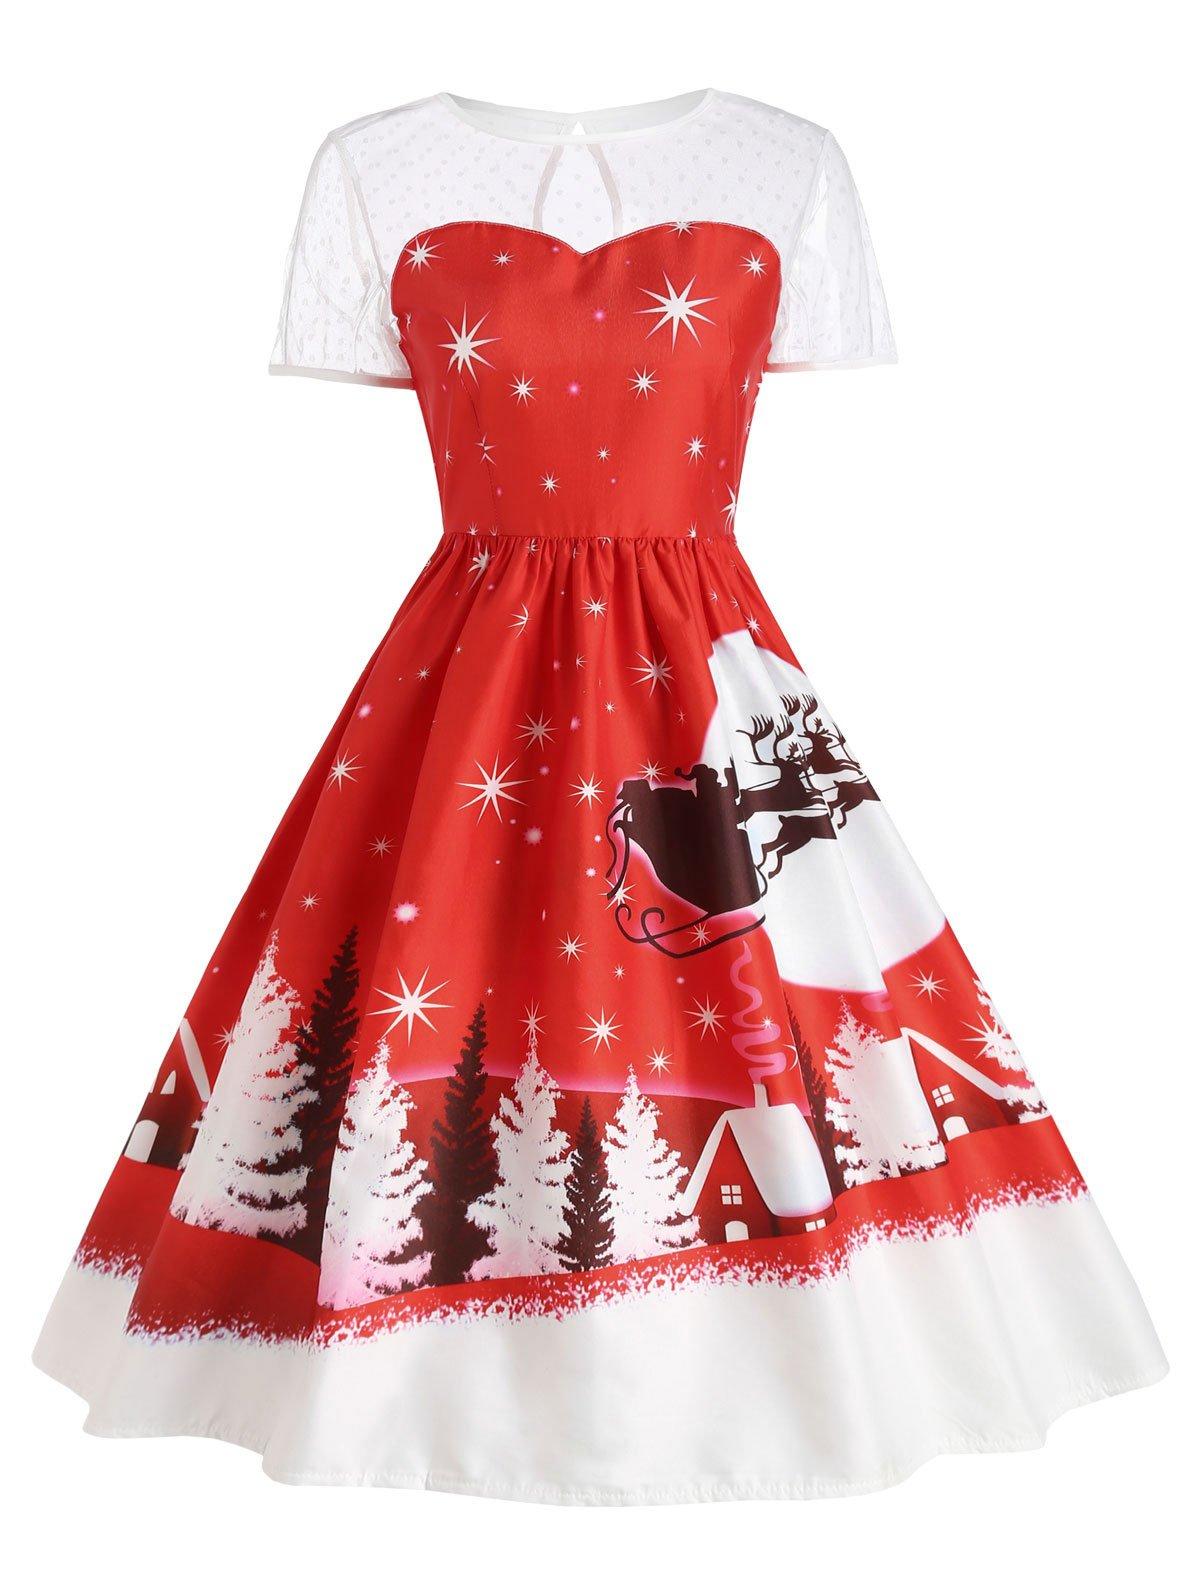 Chicloth Round Neck Short Sleeve Christmas Print Vintage Dress Vintage Red Dress Vintage Dresses Vintage Christmas Dress [ 1596 x 1200 Pixel ]